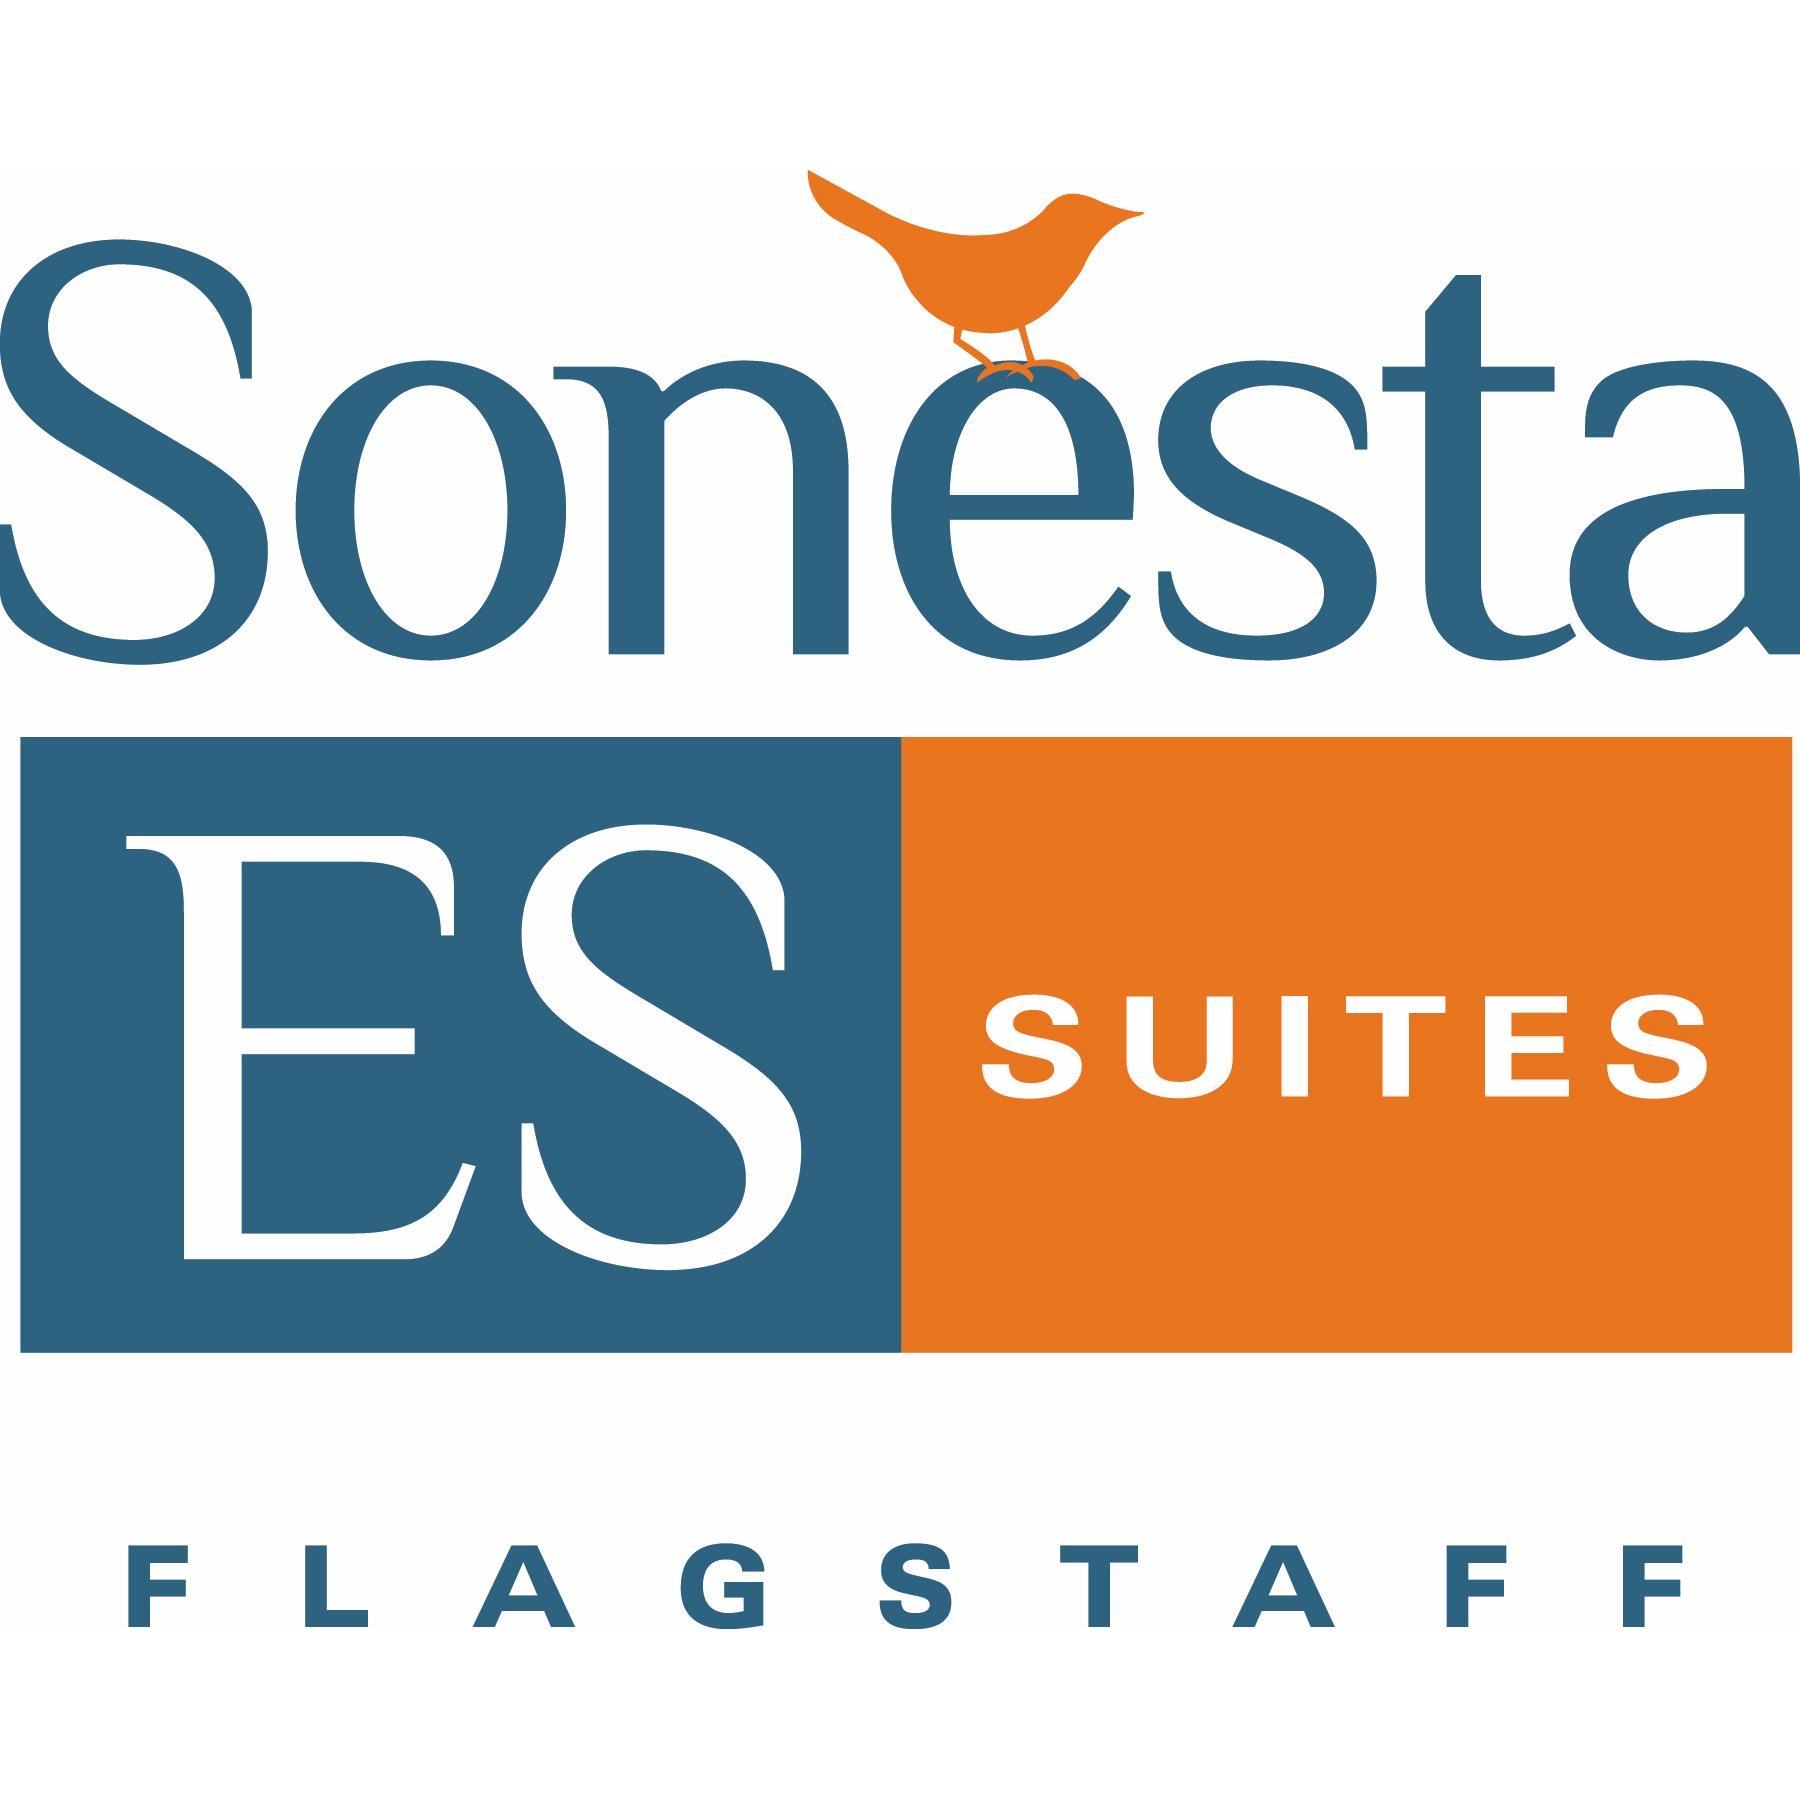 Sonesta ES Suites Flagstaff - Flagstaff, AZ - Hotels & Motels